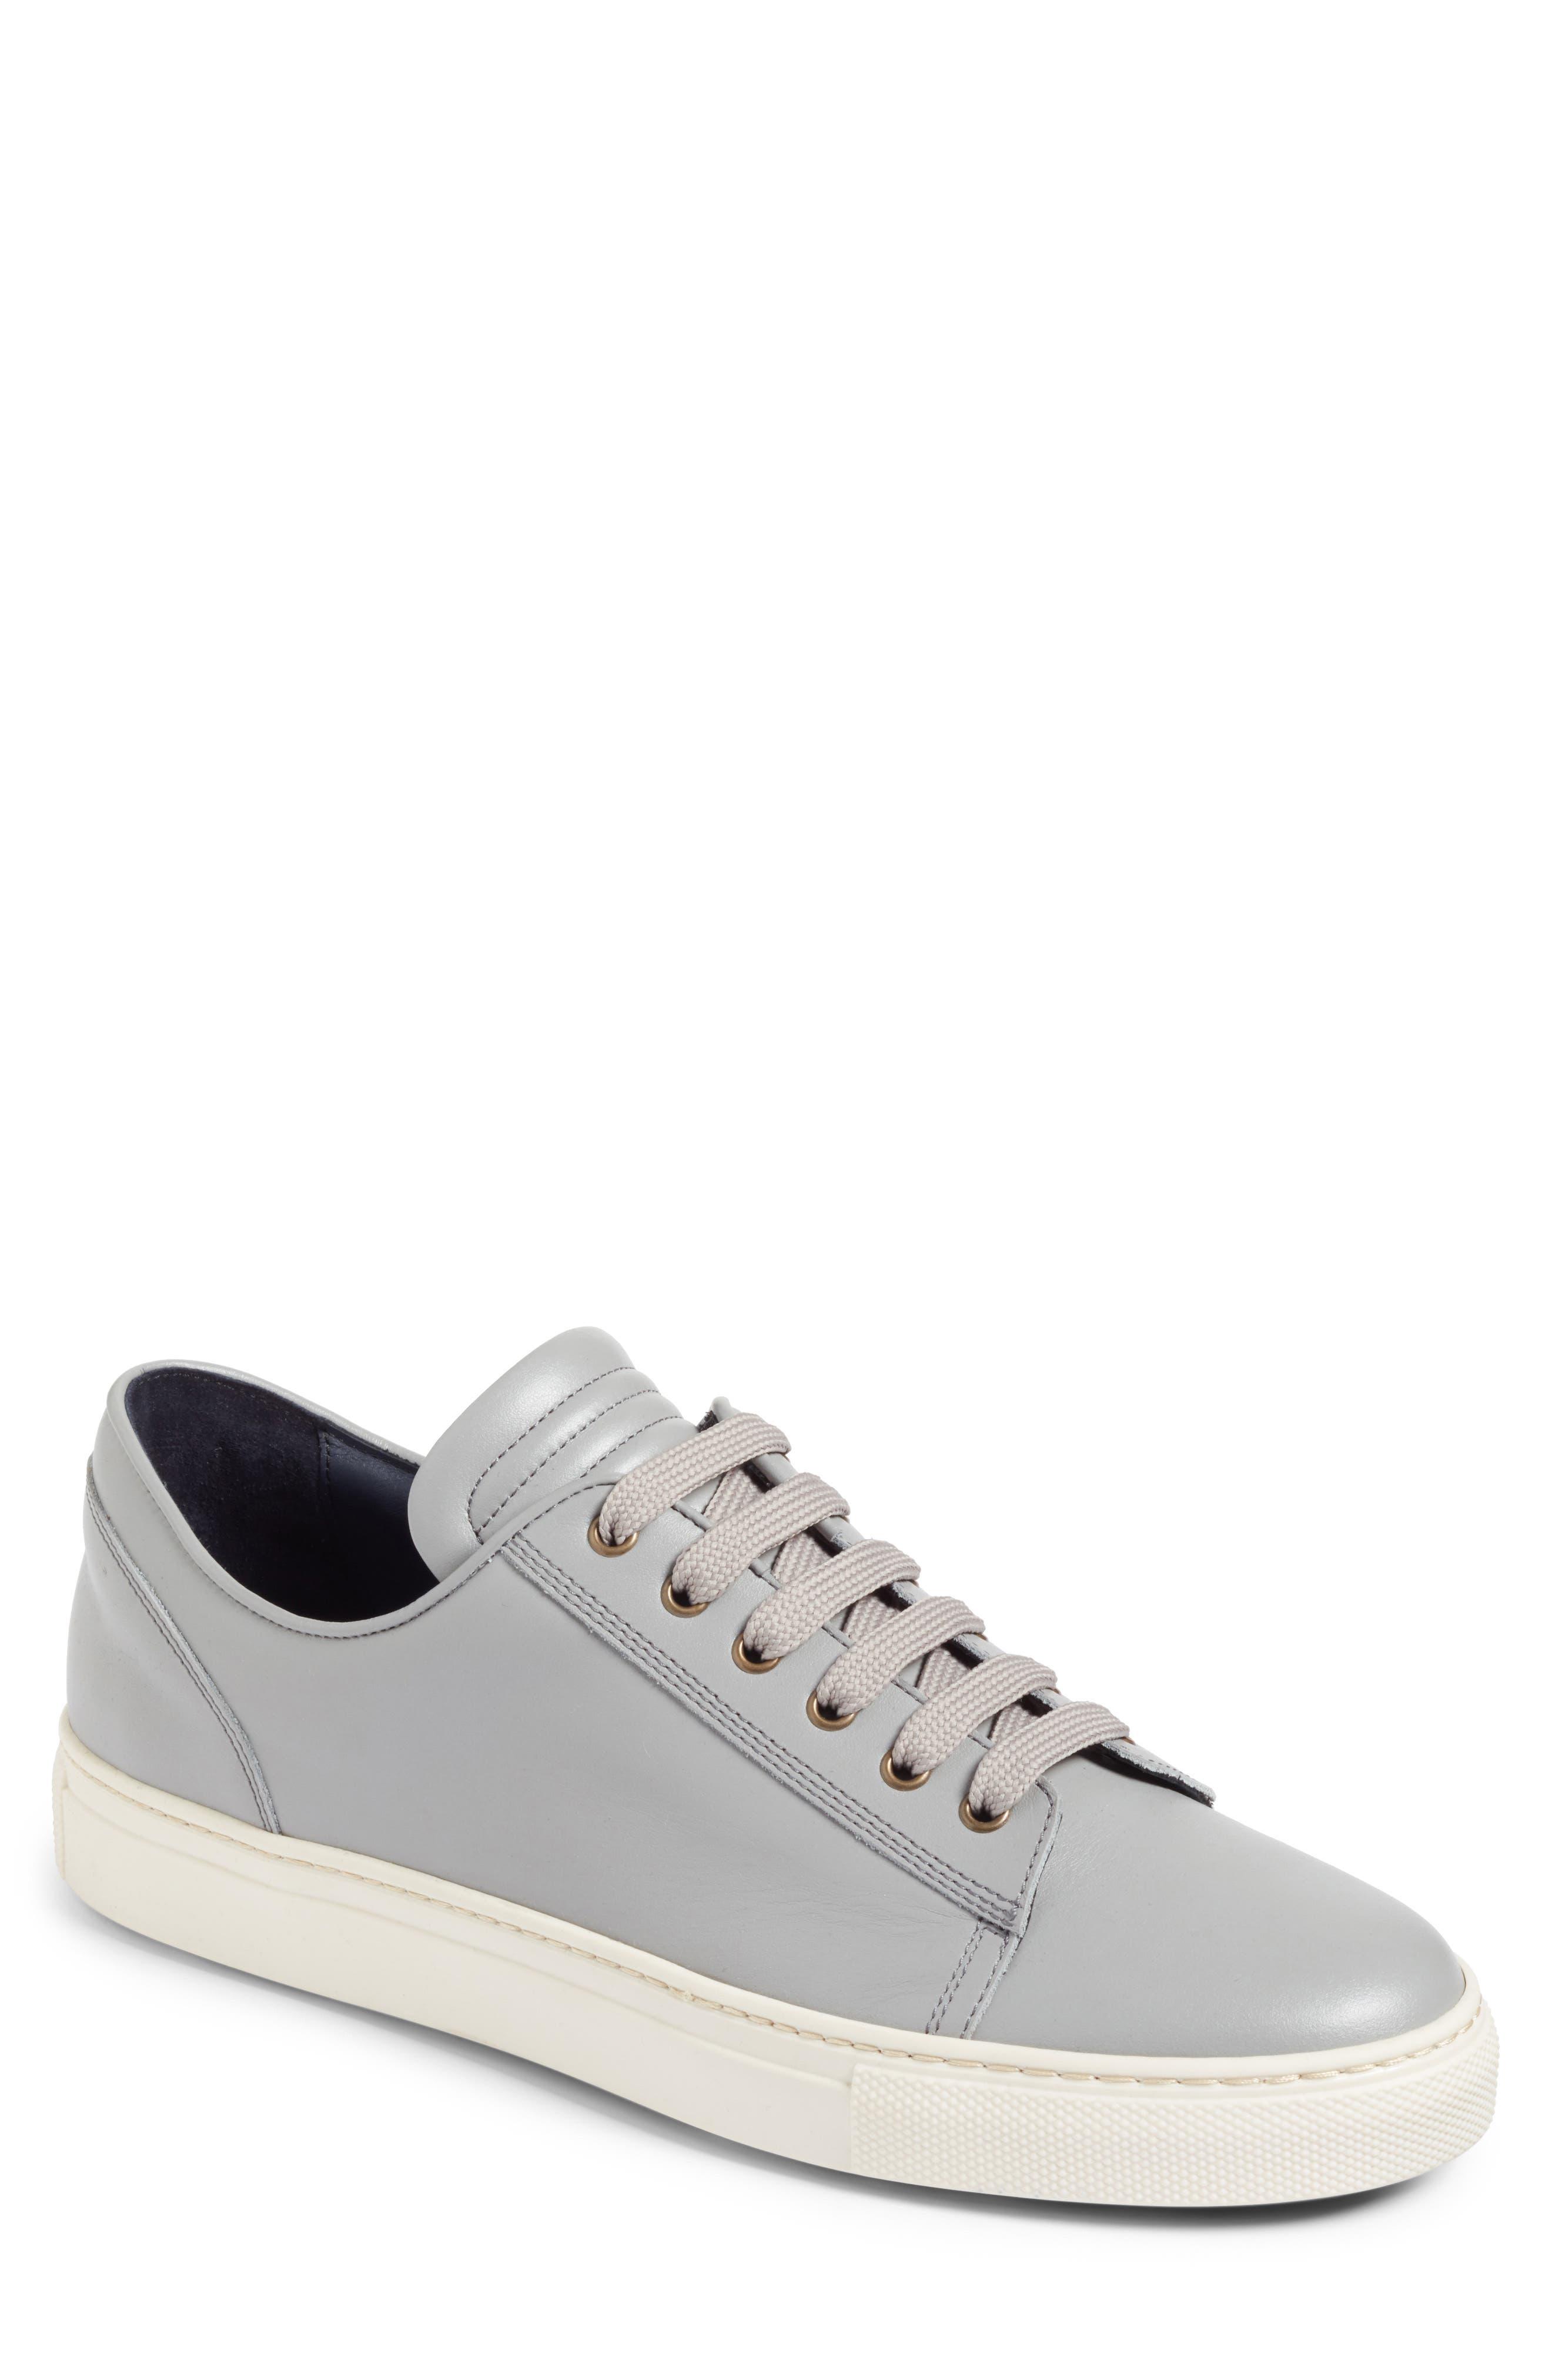 Monte Rosso Taranto Sneaker (Men)